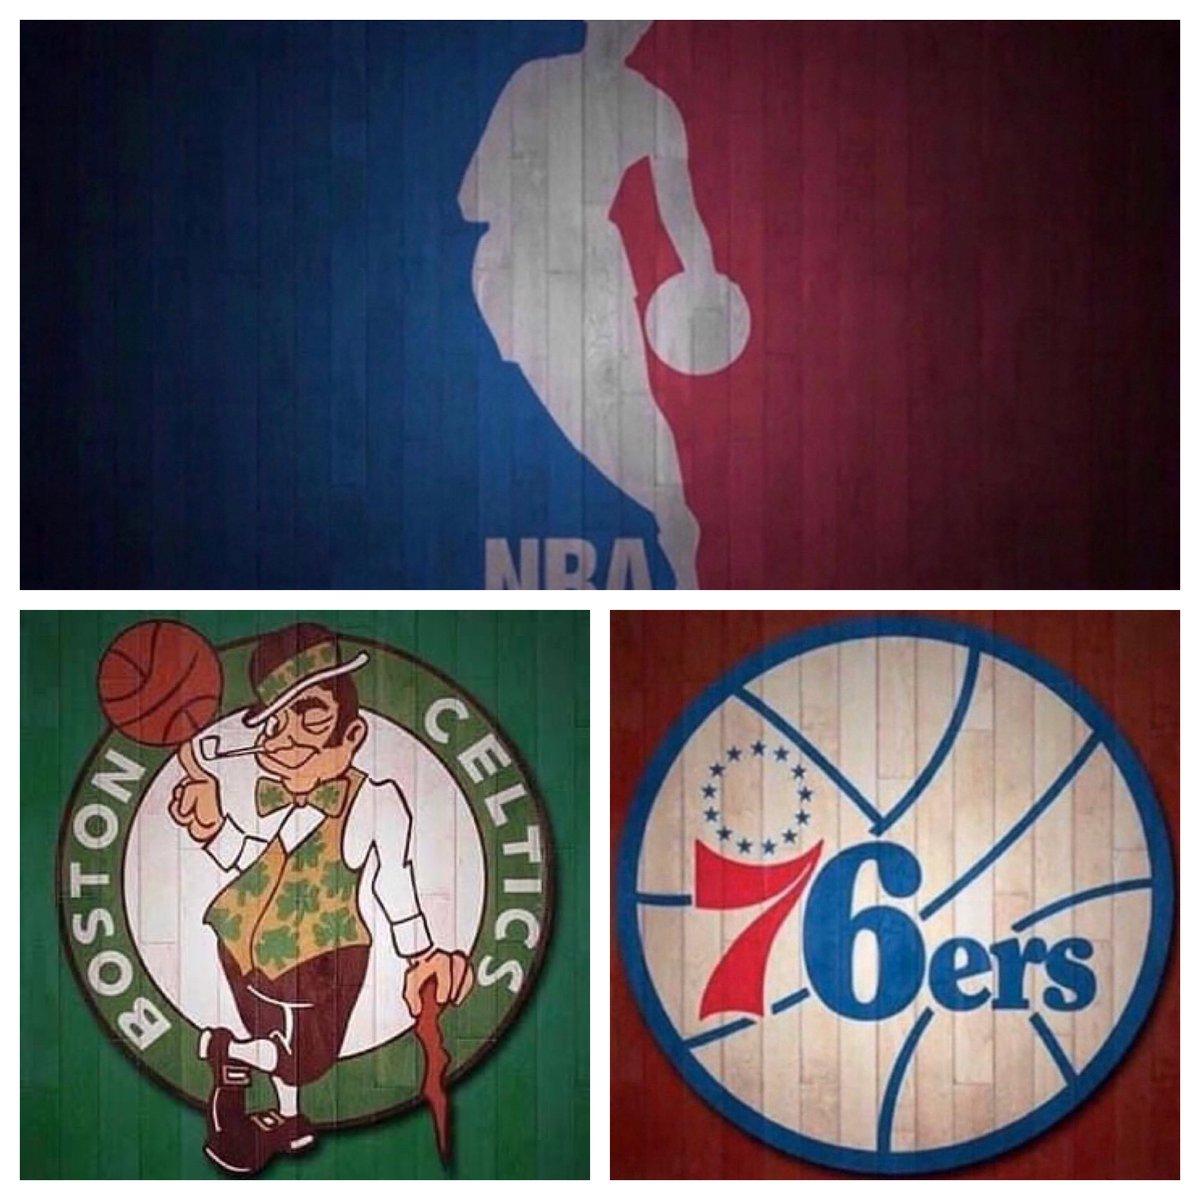 #IESRSN #Celtics @ #76ers is underway! #NBA #BOSvsPHI #BleedGreen #HereTheyCome